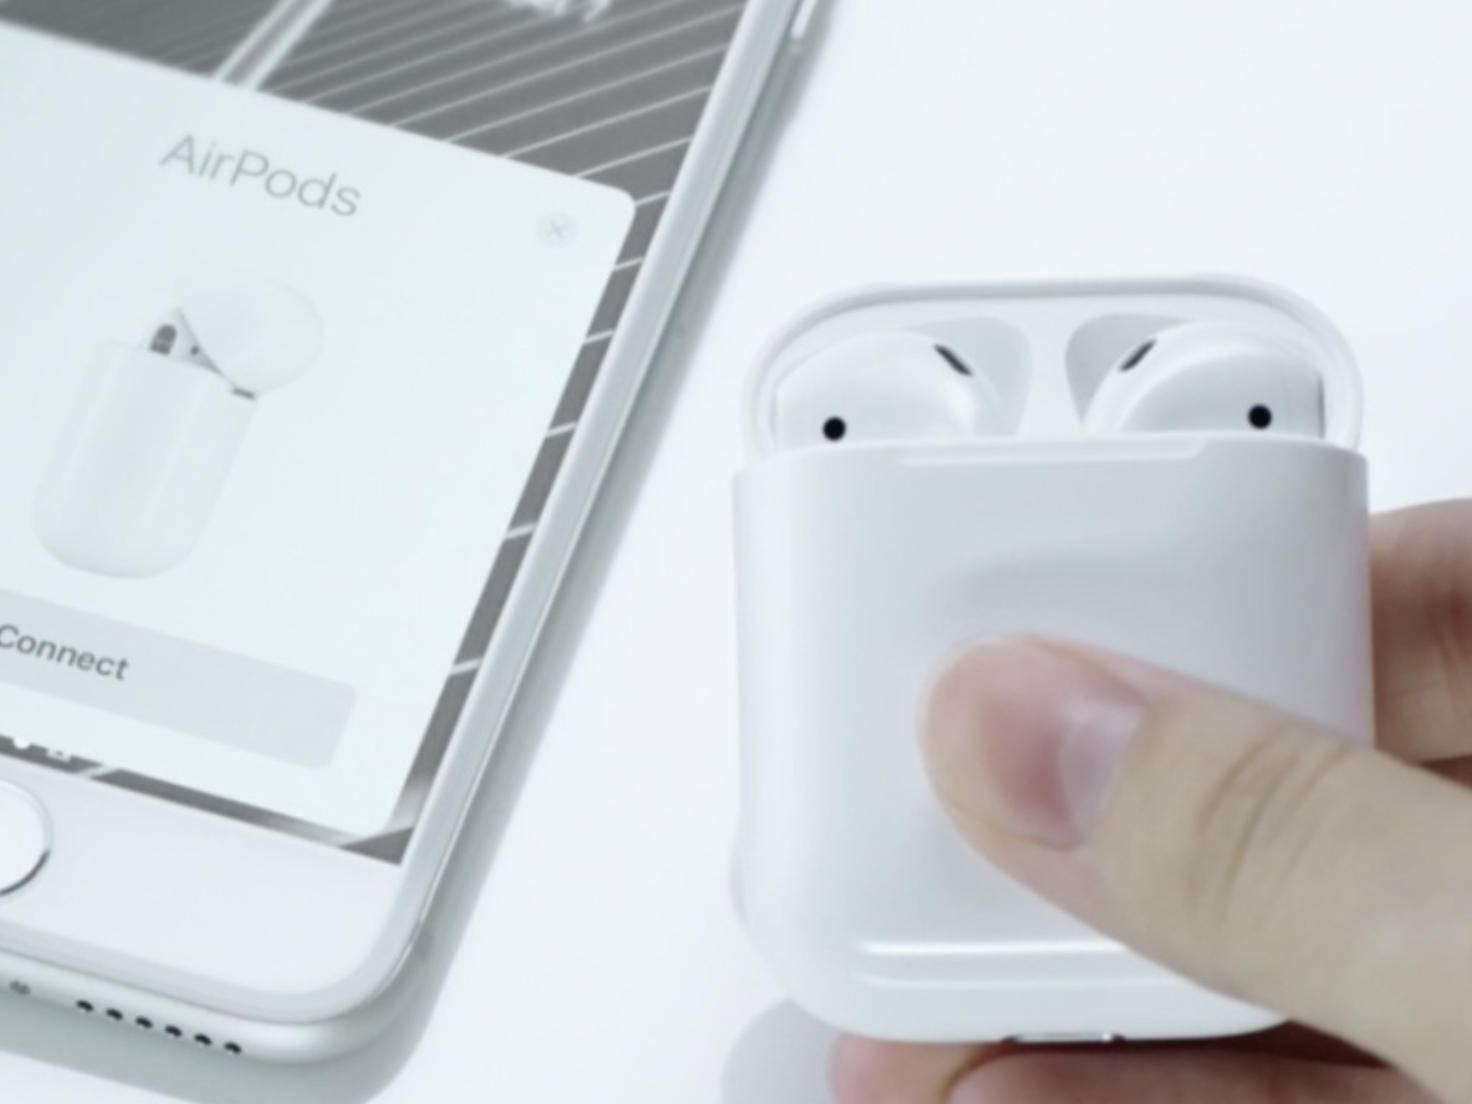 Apple AirPods Box iPhone 7.jpg